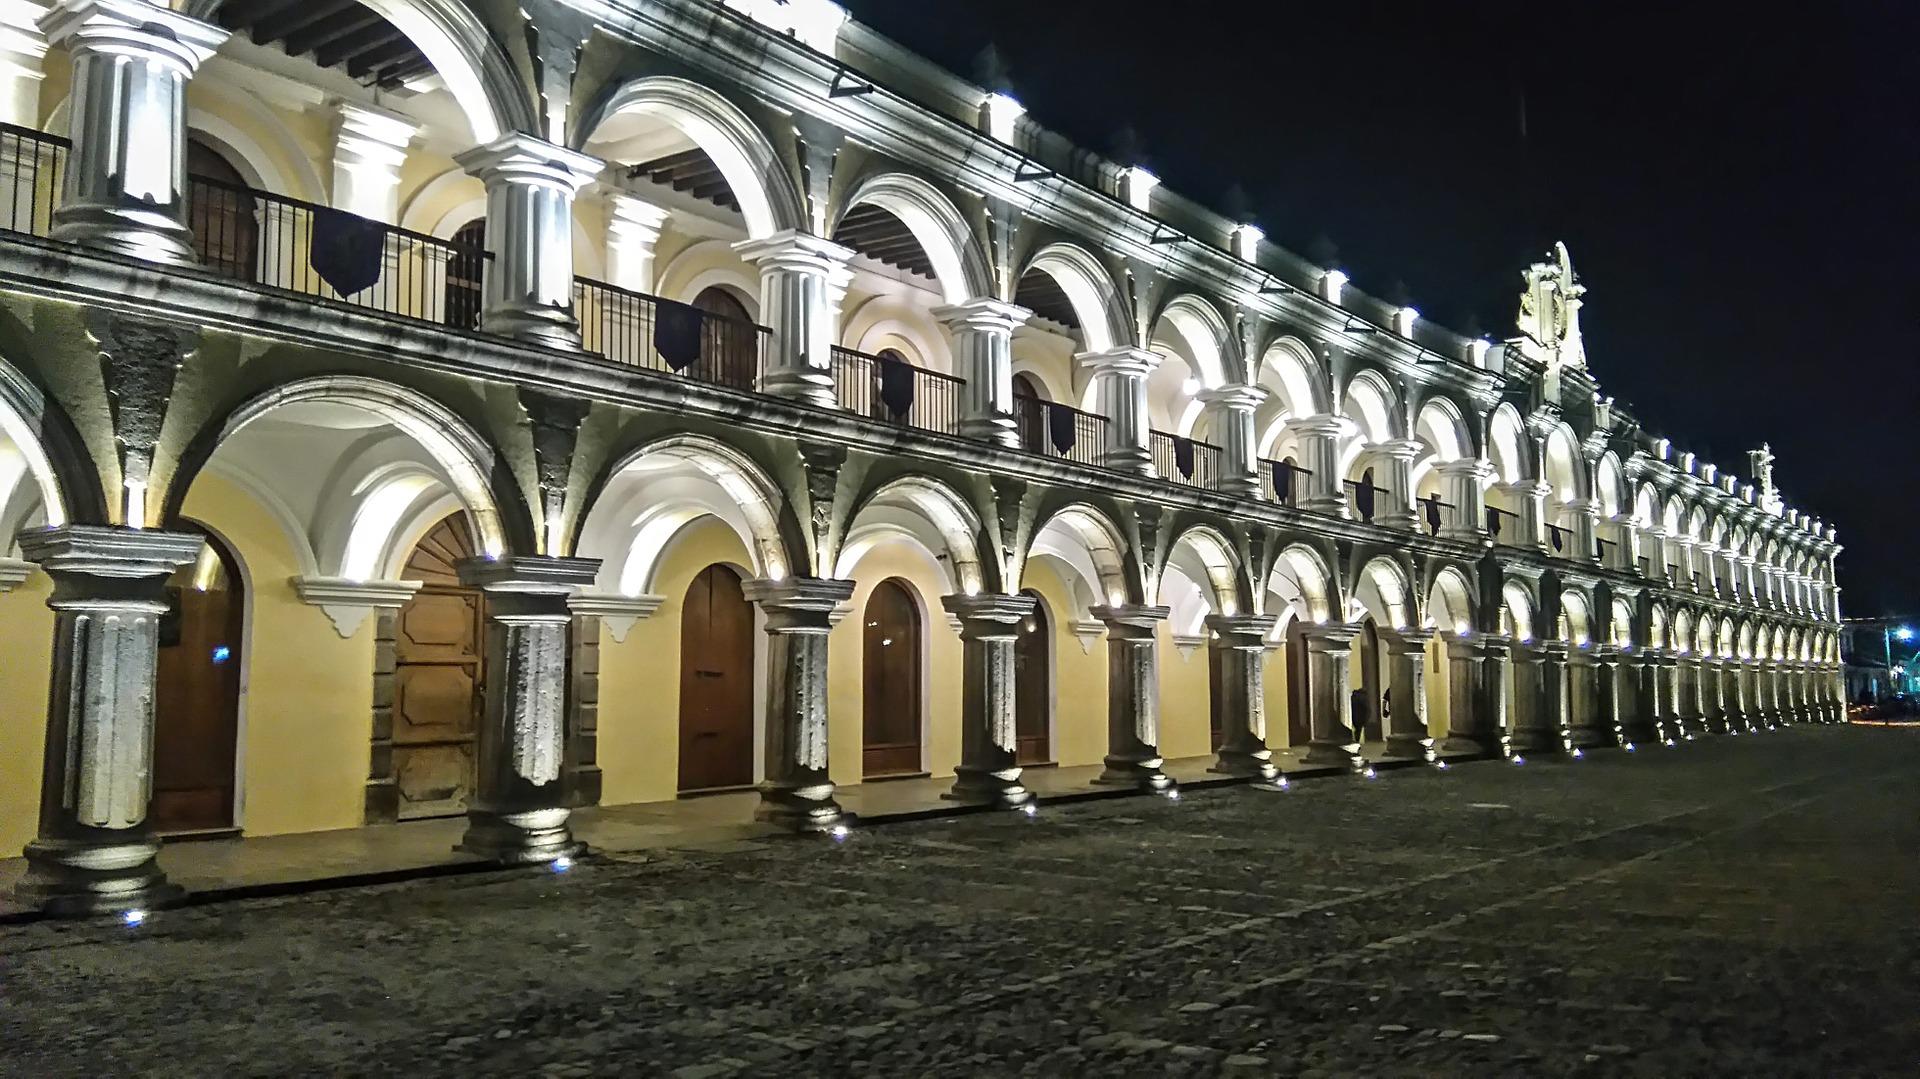 Descubra a Guatemala